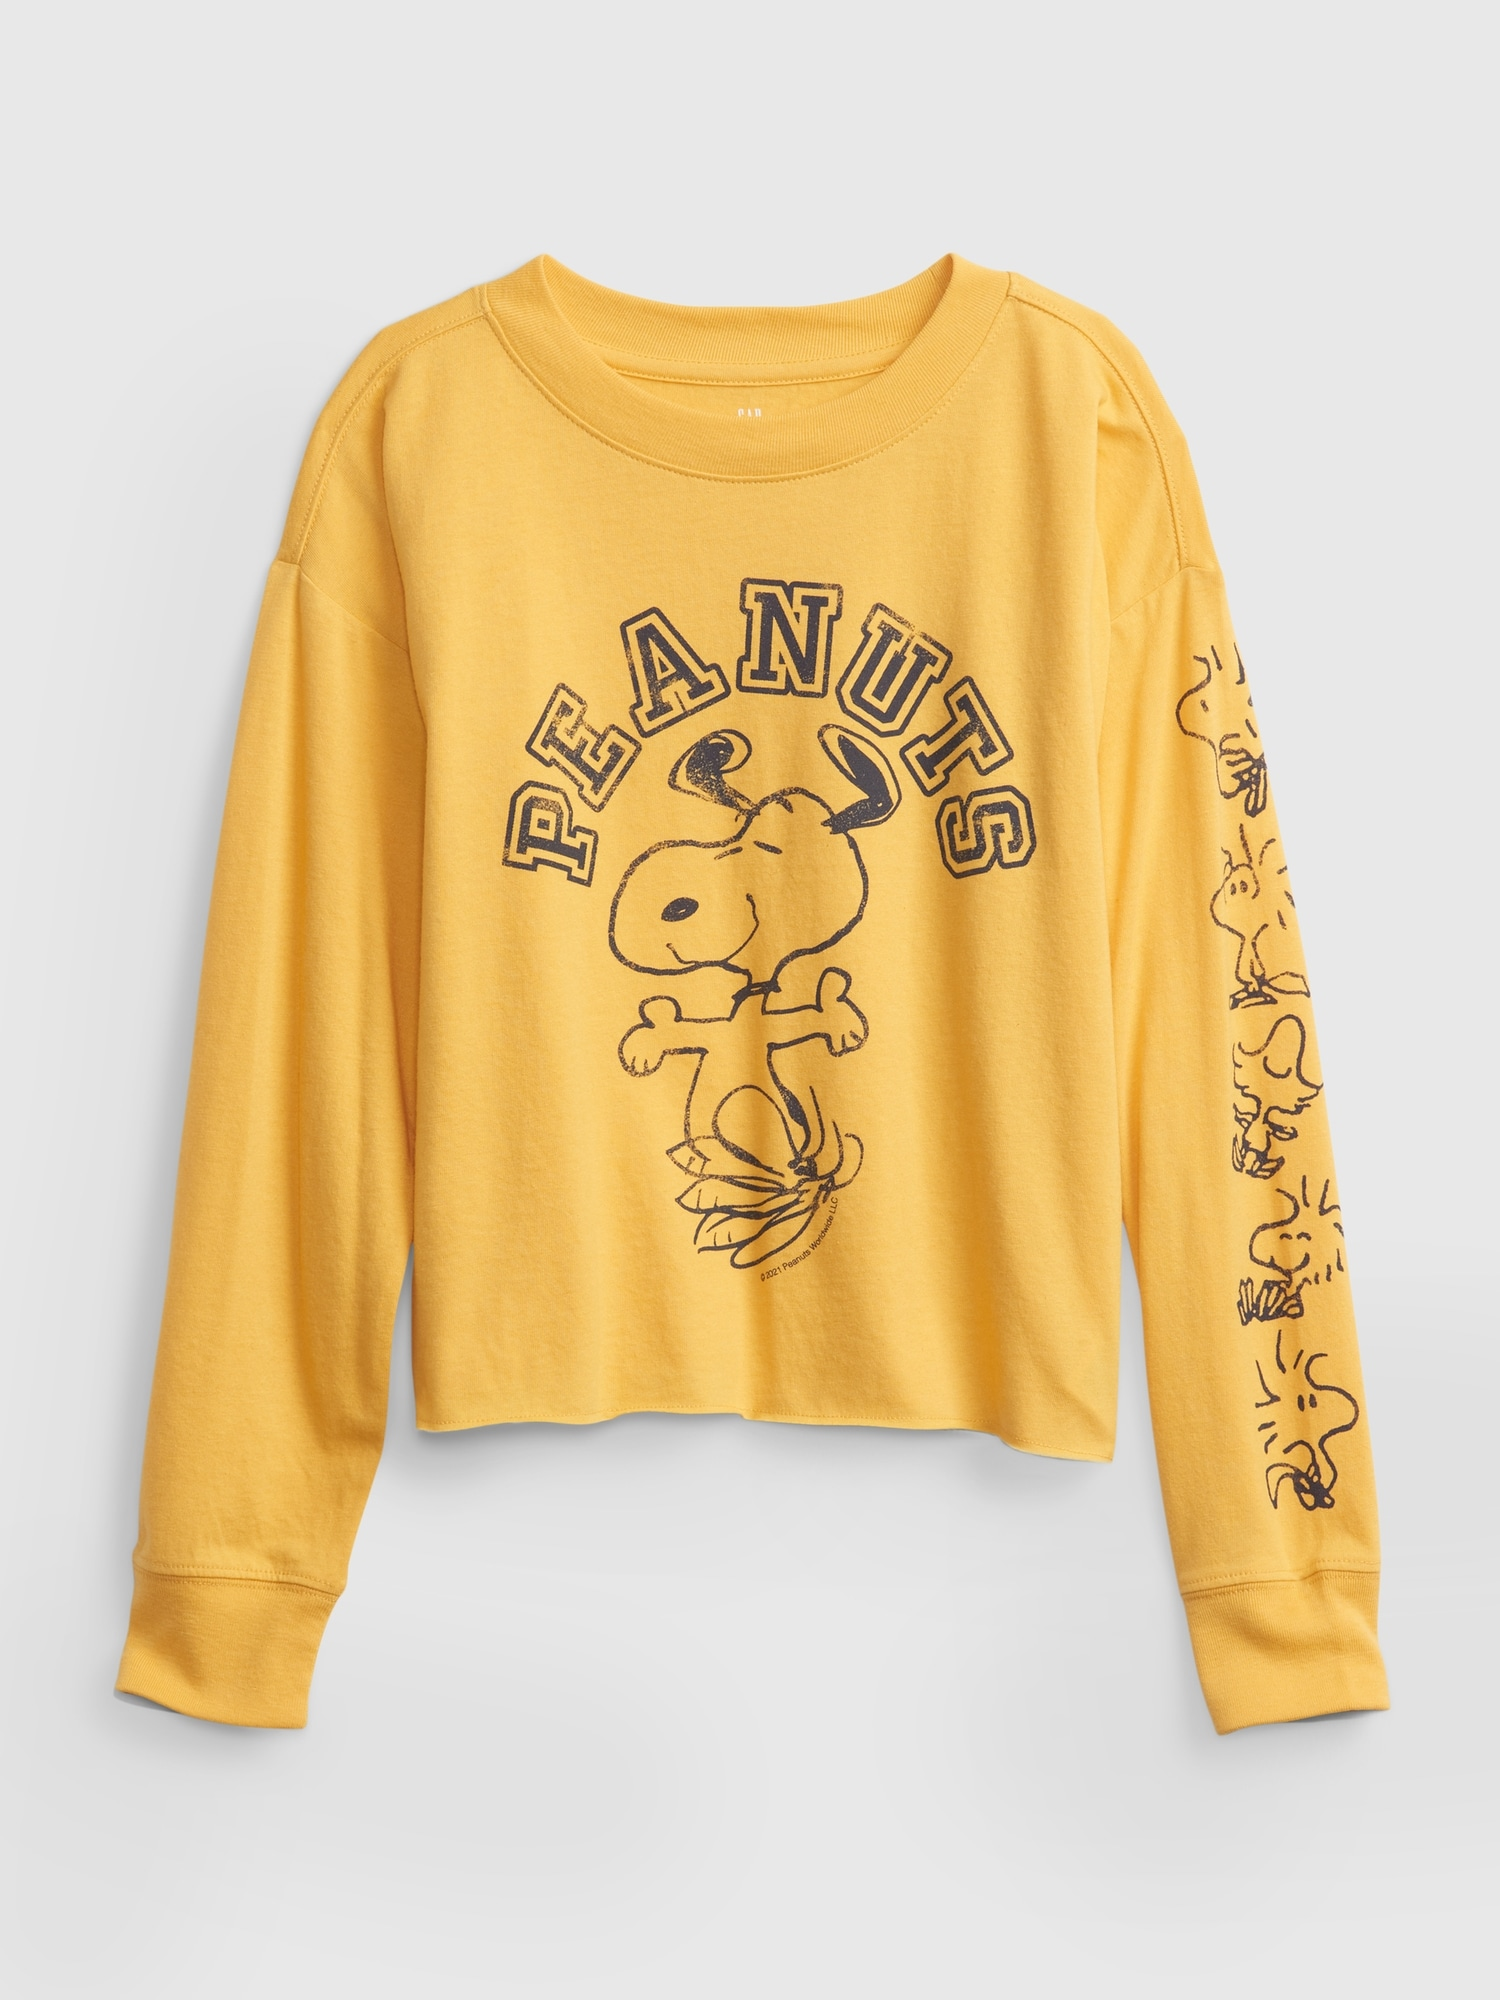 Gapkids ピーナッツ グラフィックtシャツ